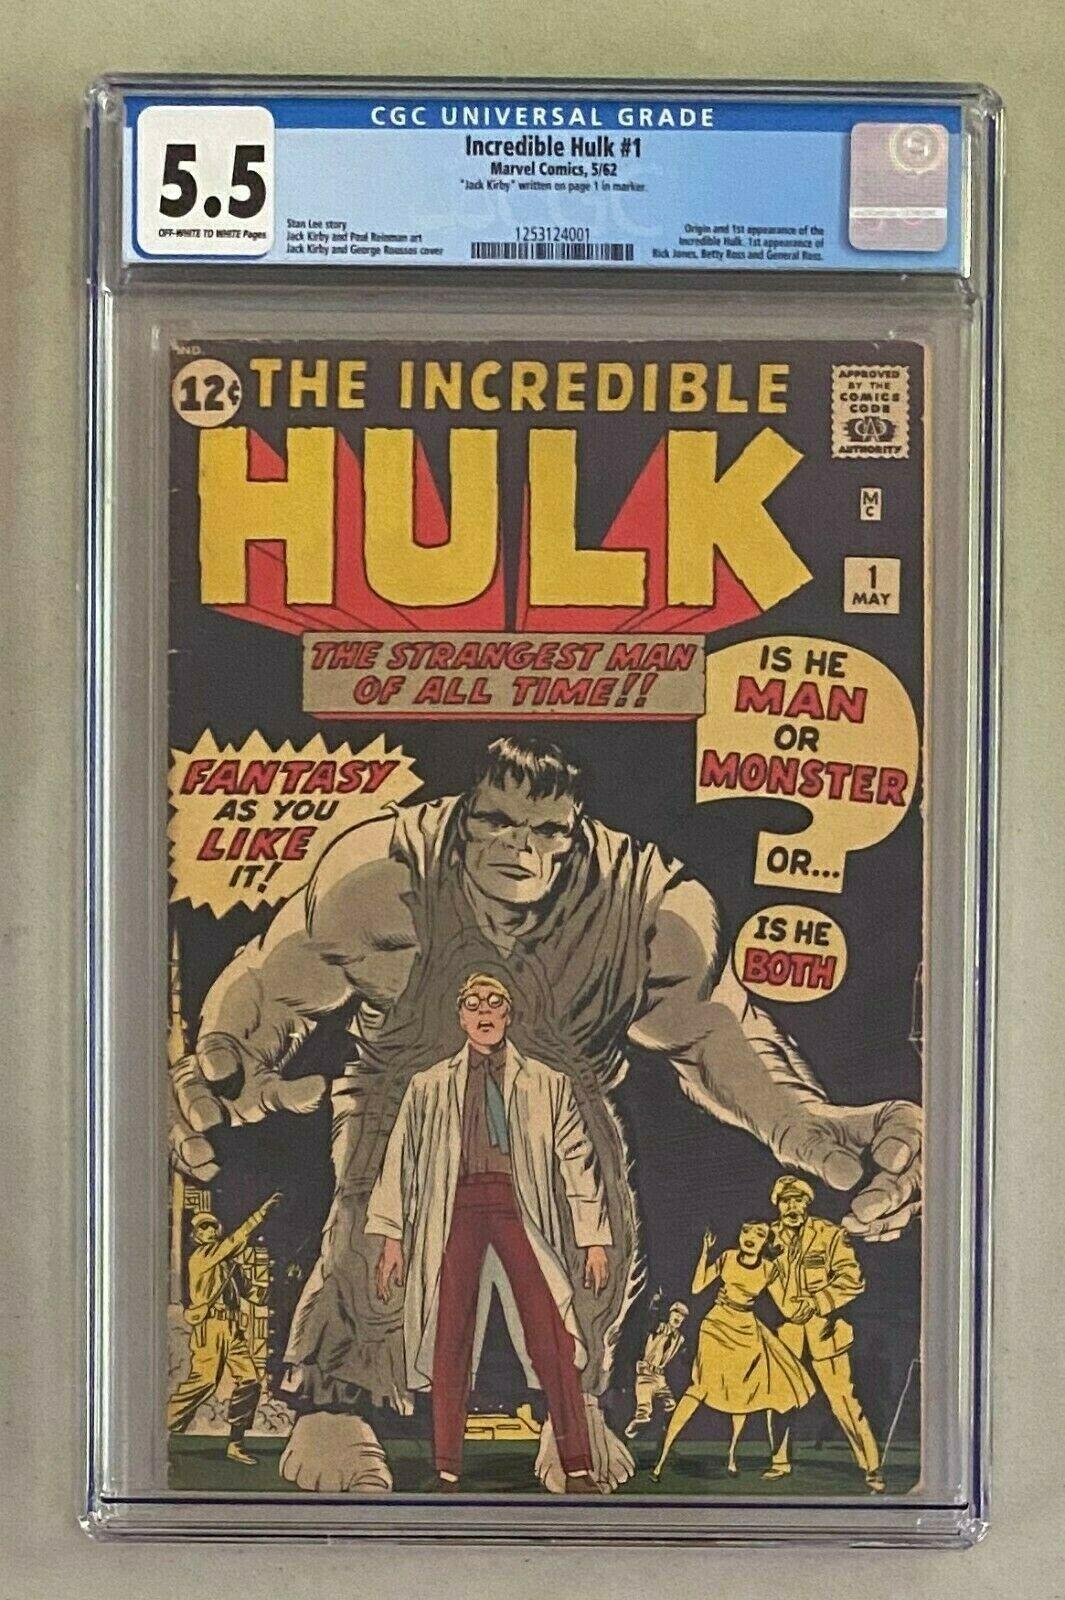 INCREDIBLE HULK 1 Marvel Comics 1962 CGC 55 Origin  1st Appearance